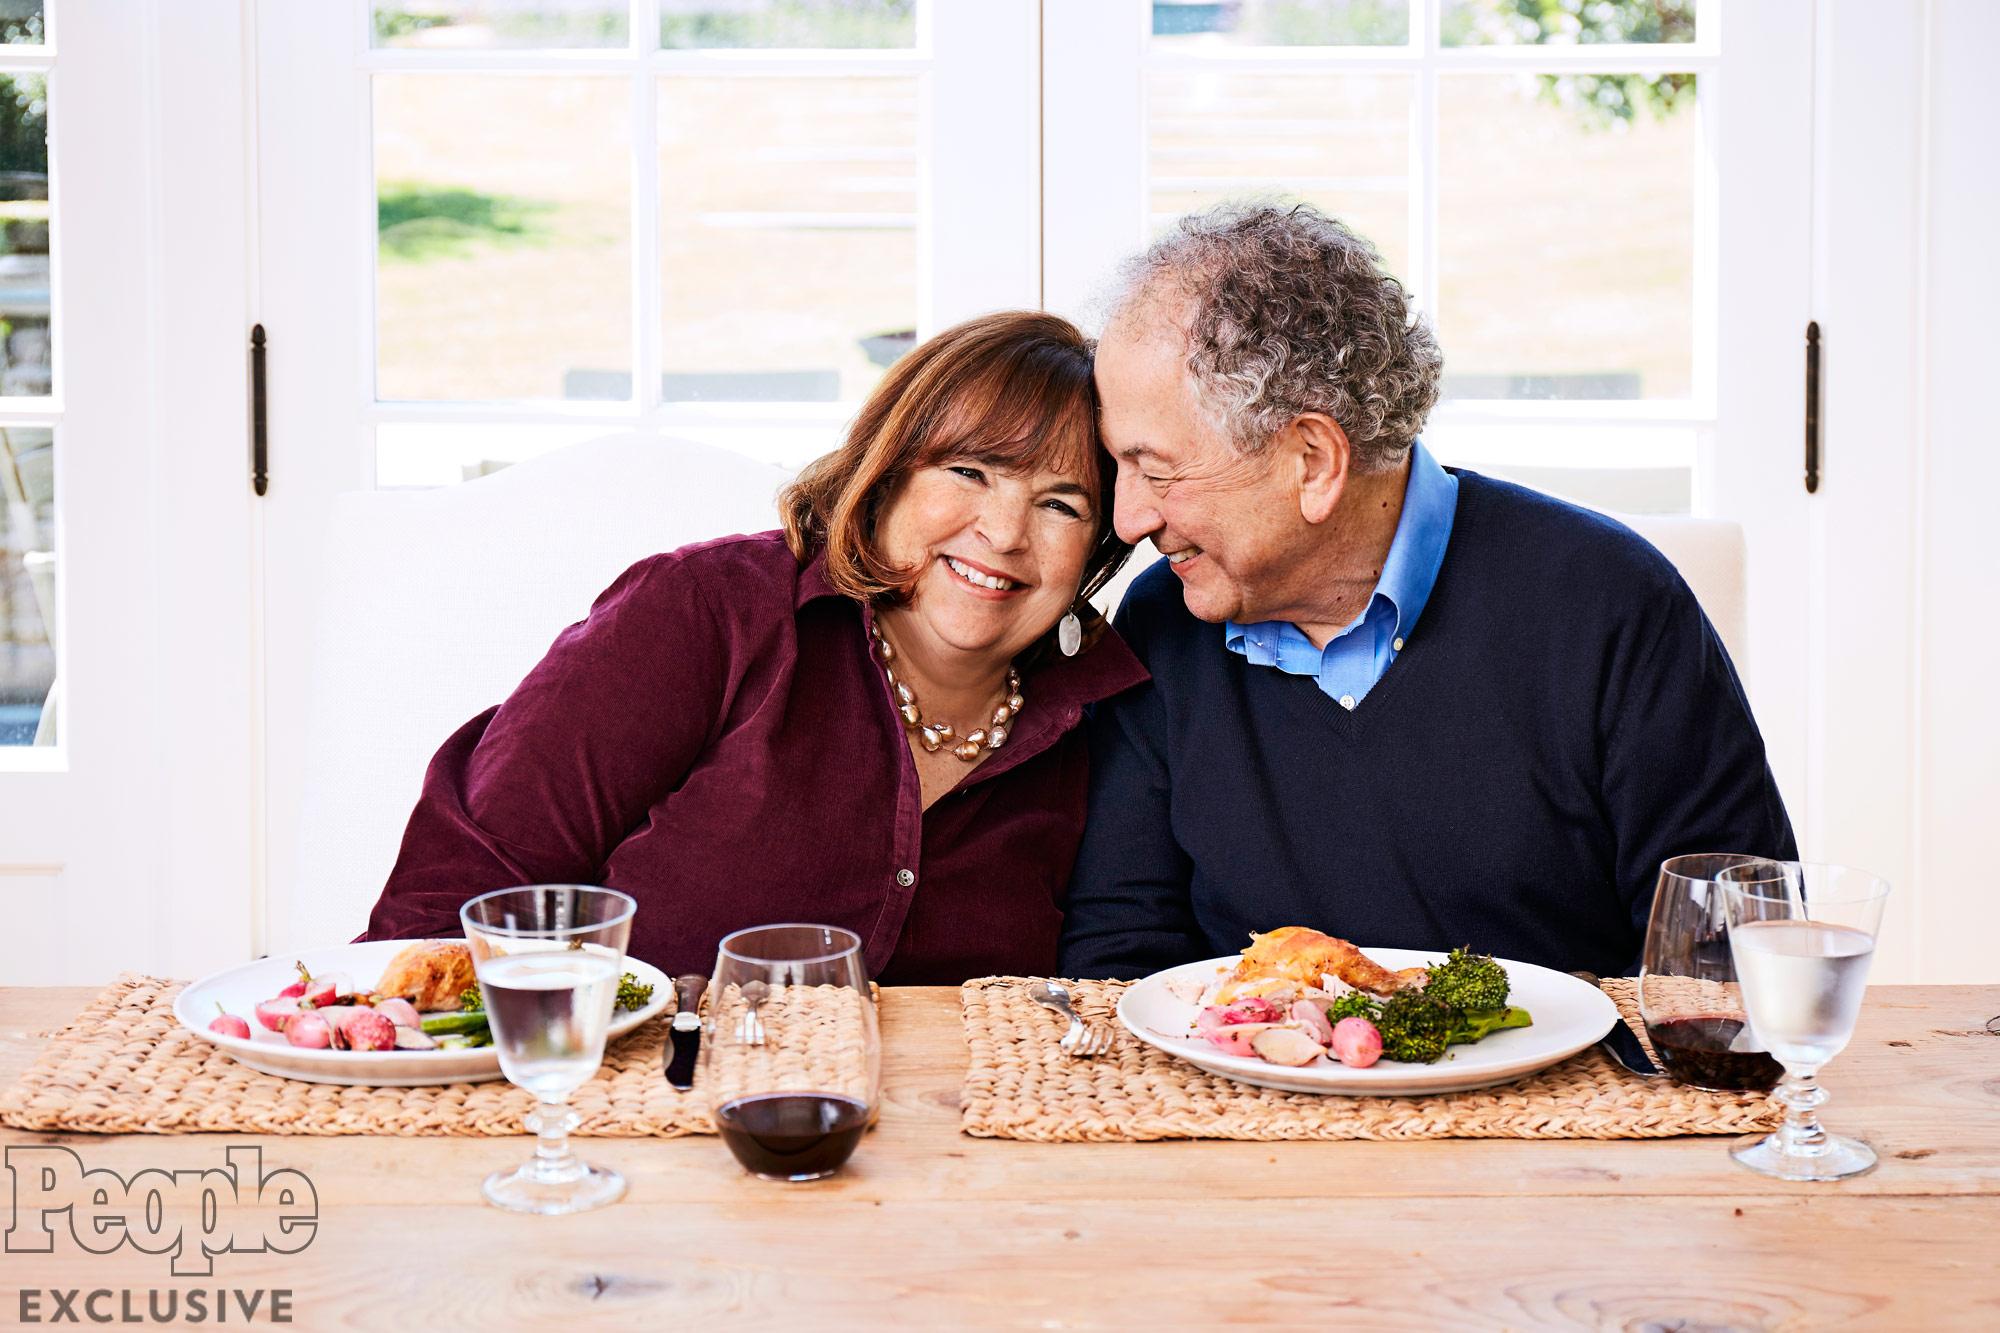 Ina Garten's New Cookbook & Dining Room Tips! 4.